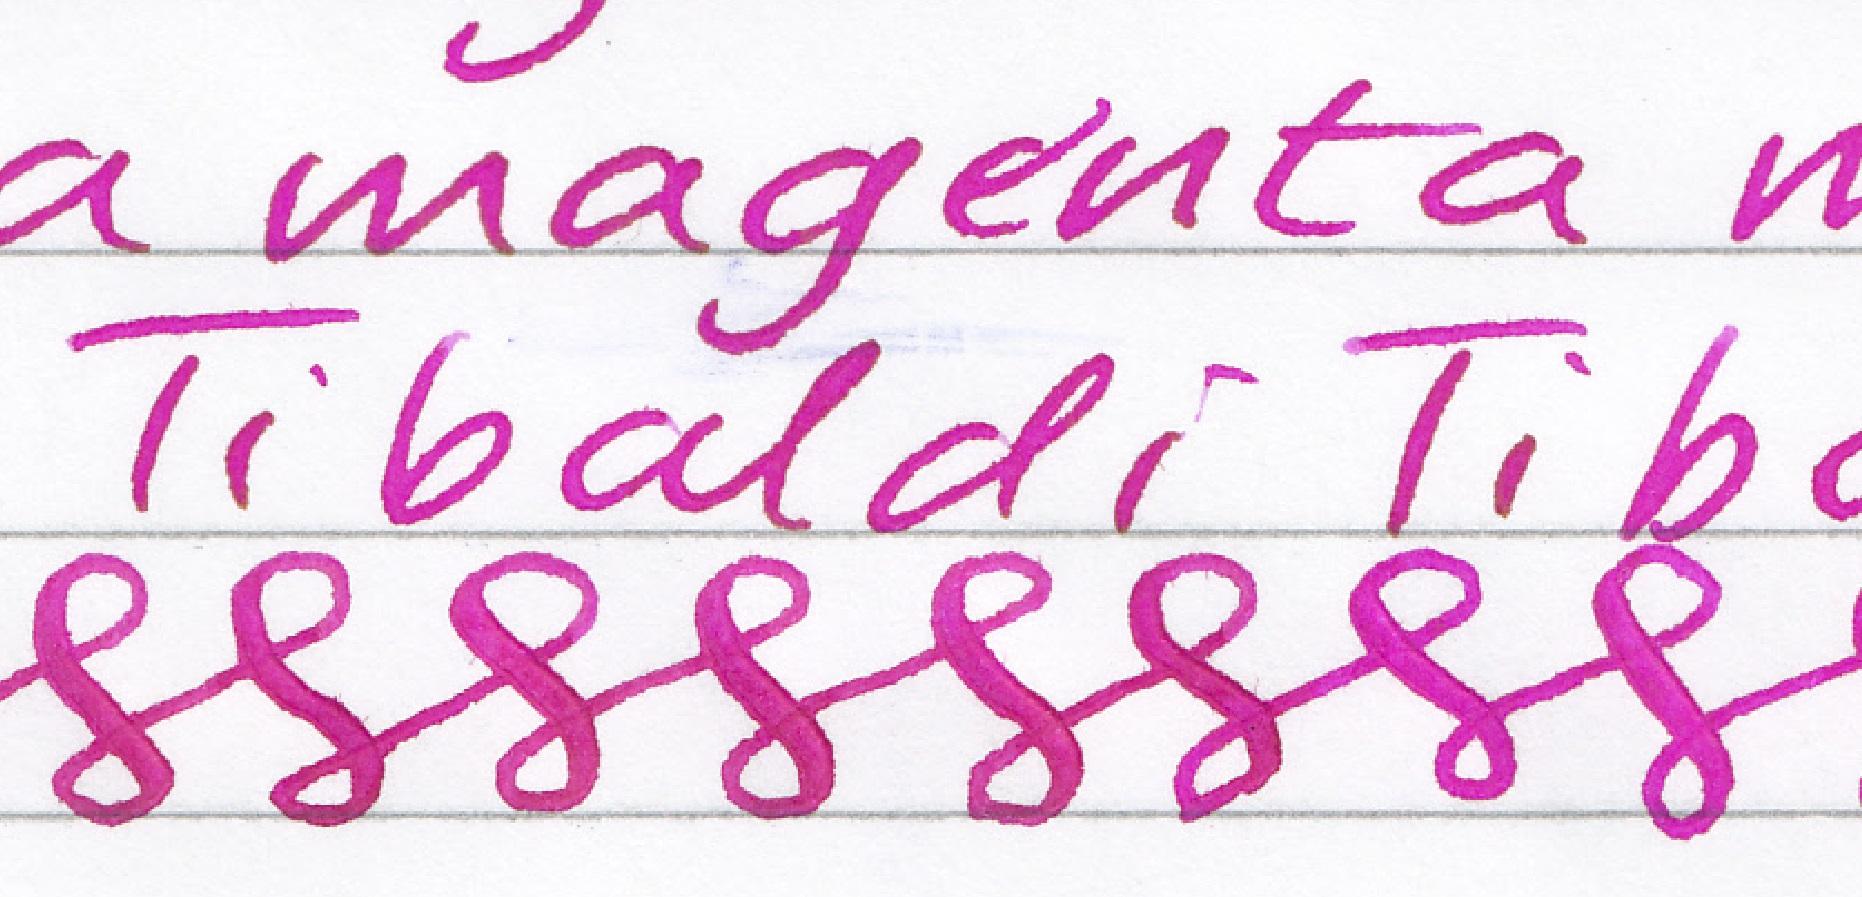 fpn_1458075704__magenta_tibaldi_lyreco_3